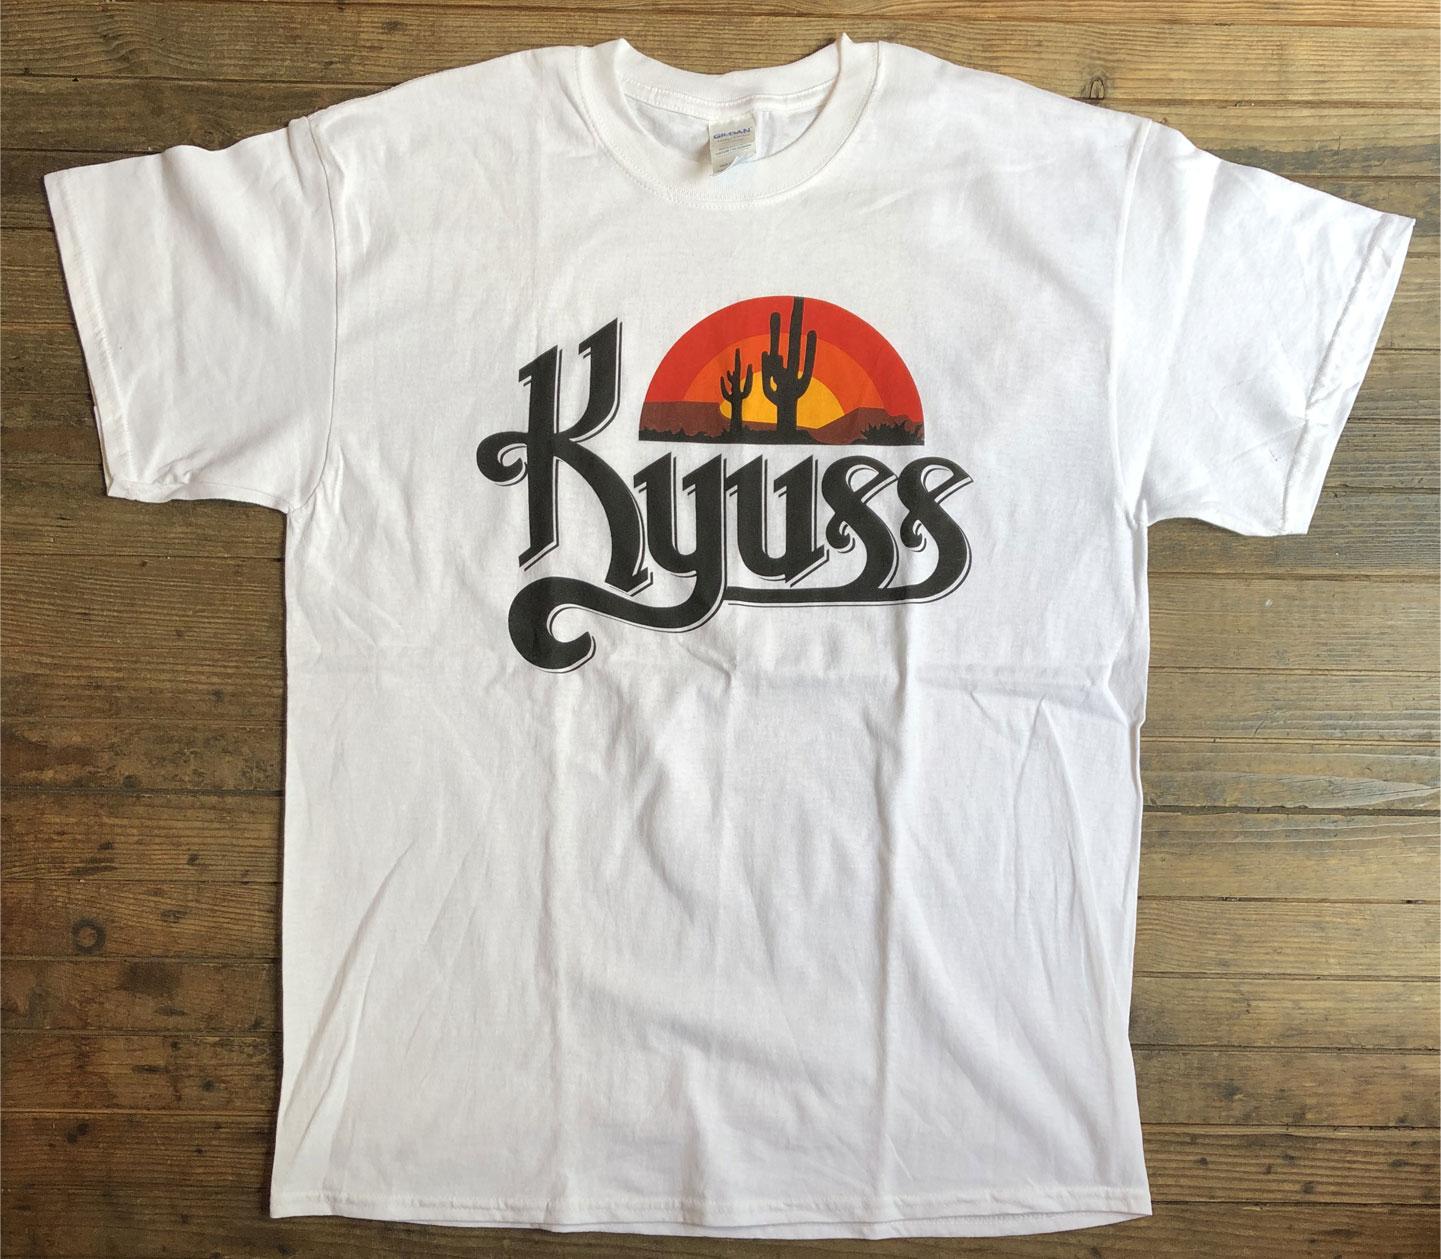 USED! KYUSS Tシャツ